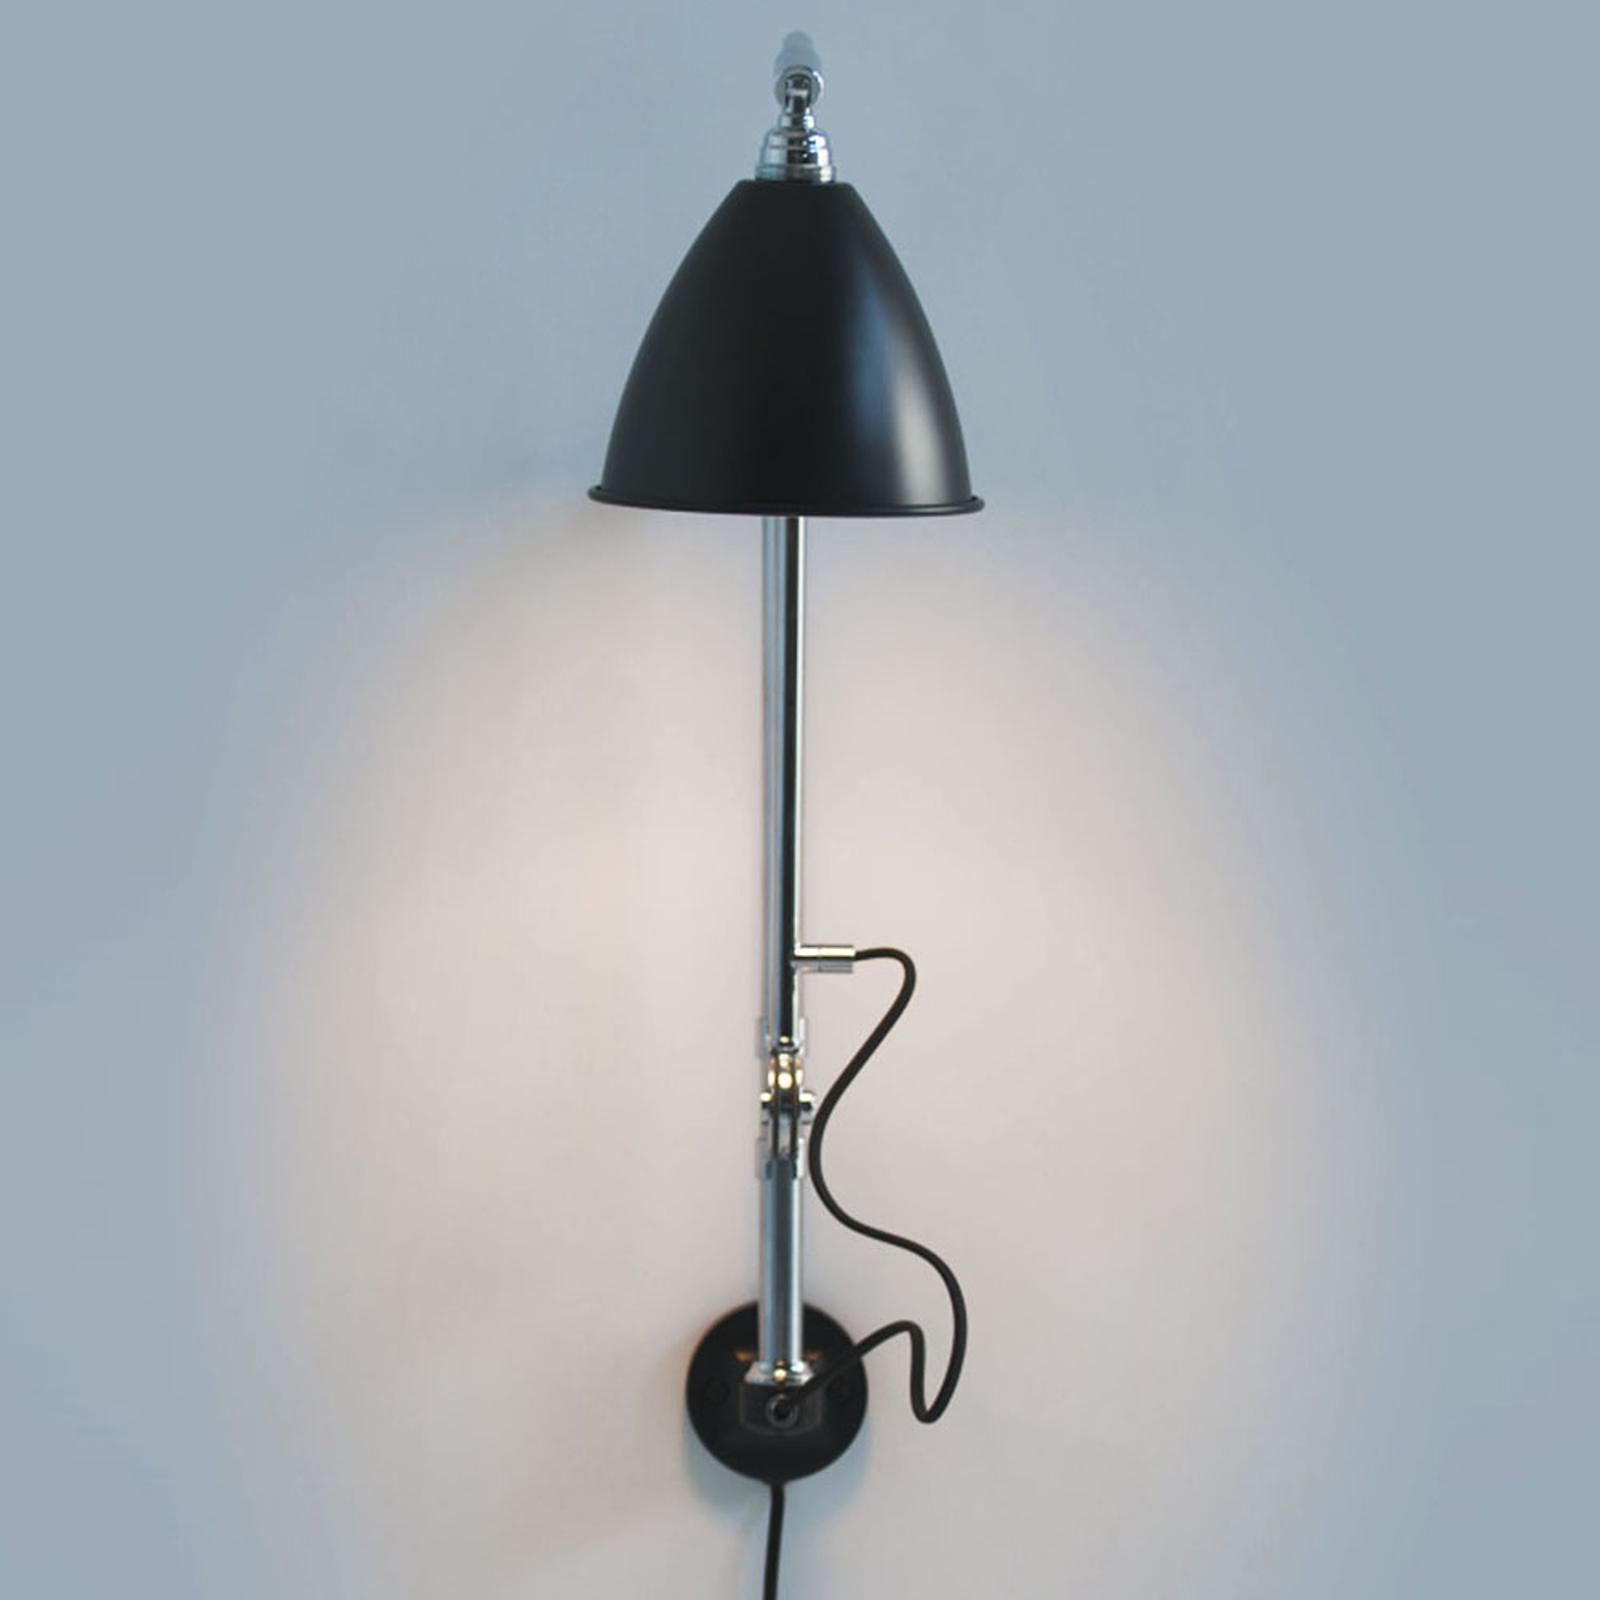 GUBI Bestlite BL5 wandlamp chroom/zwart